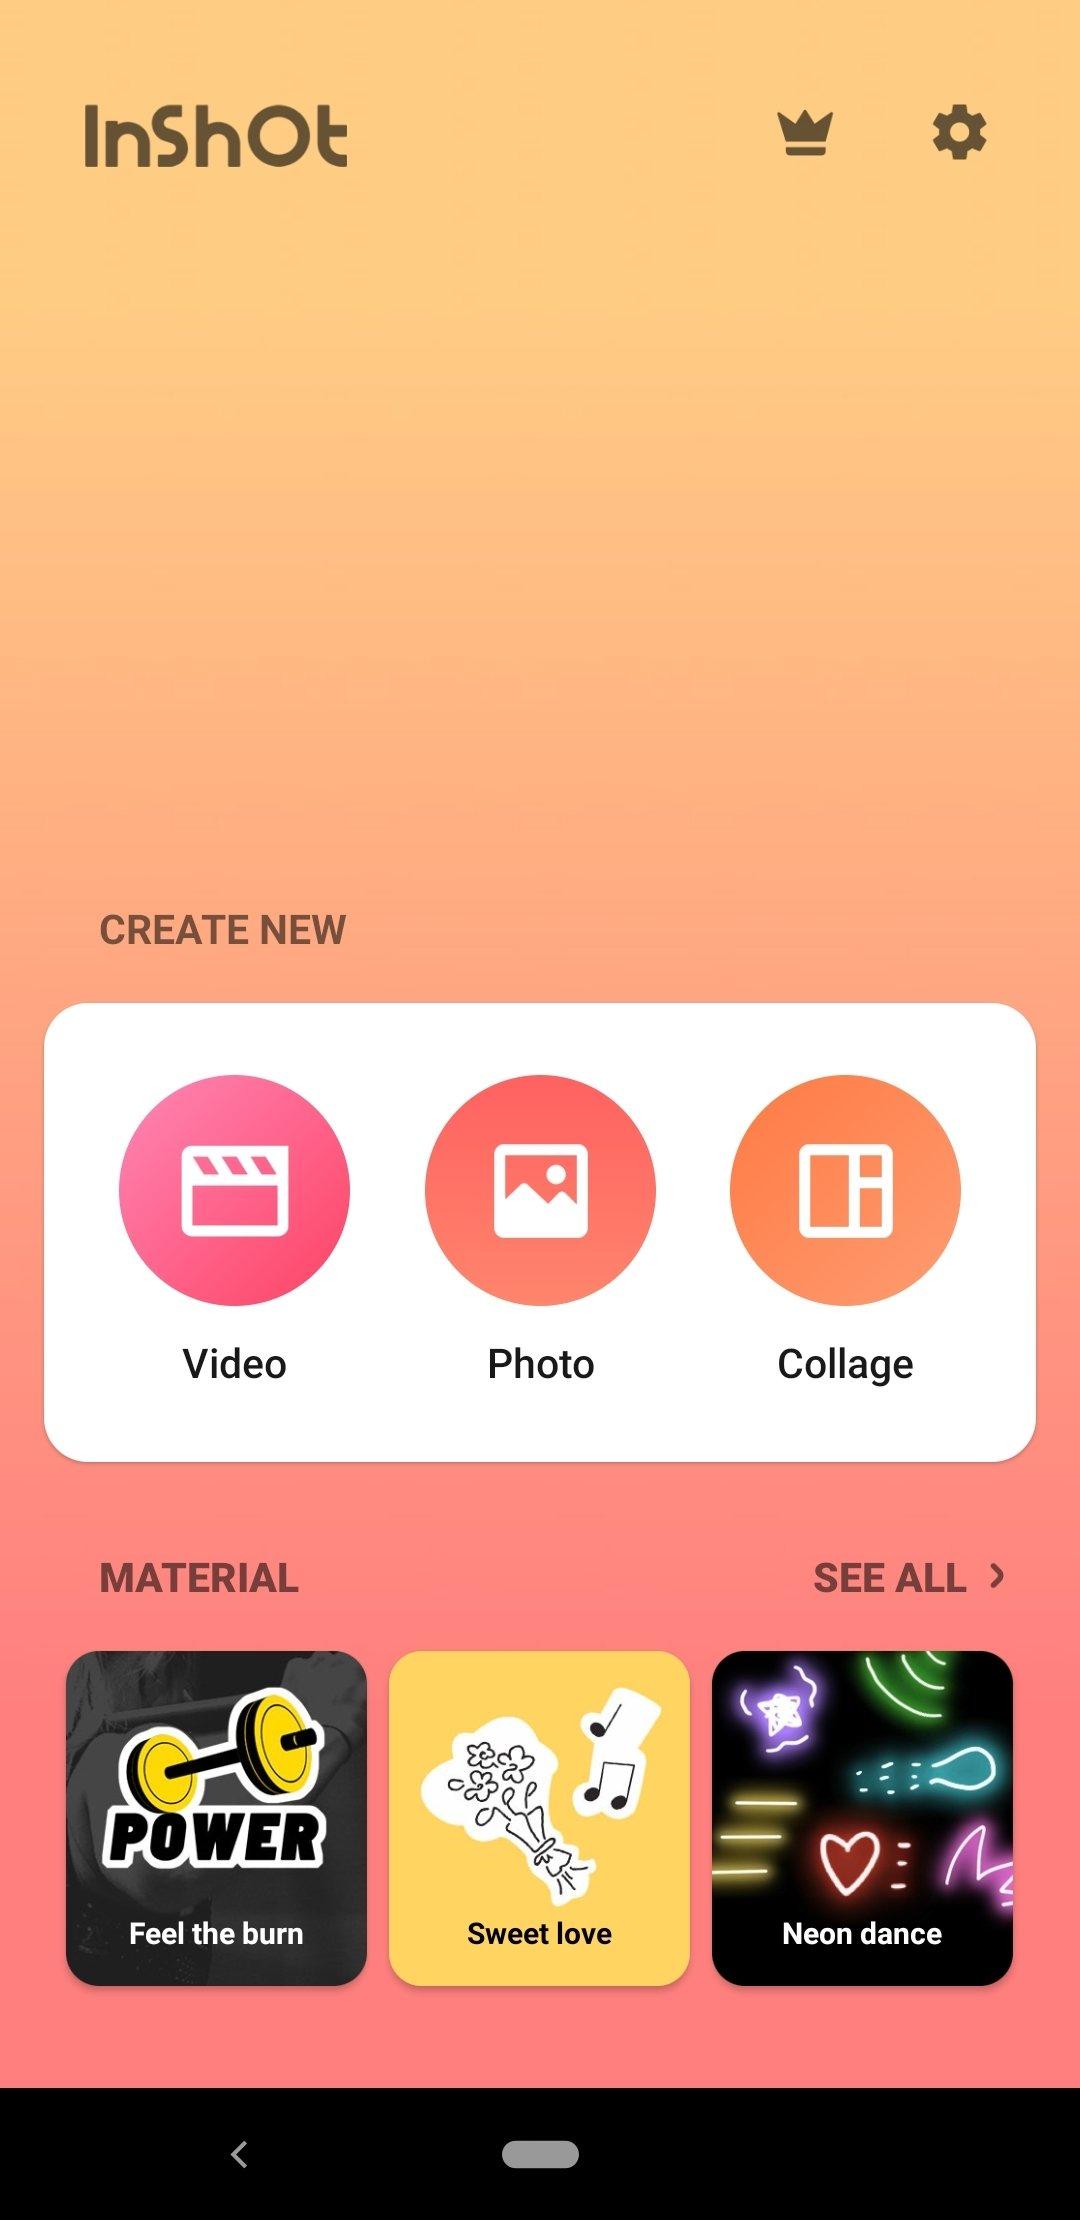 descargar inshot - editor de v u00eddeo y foto m u00fasica 1 524 190 android